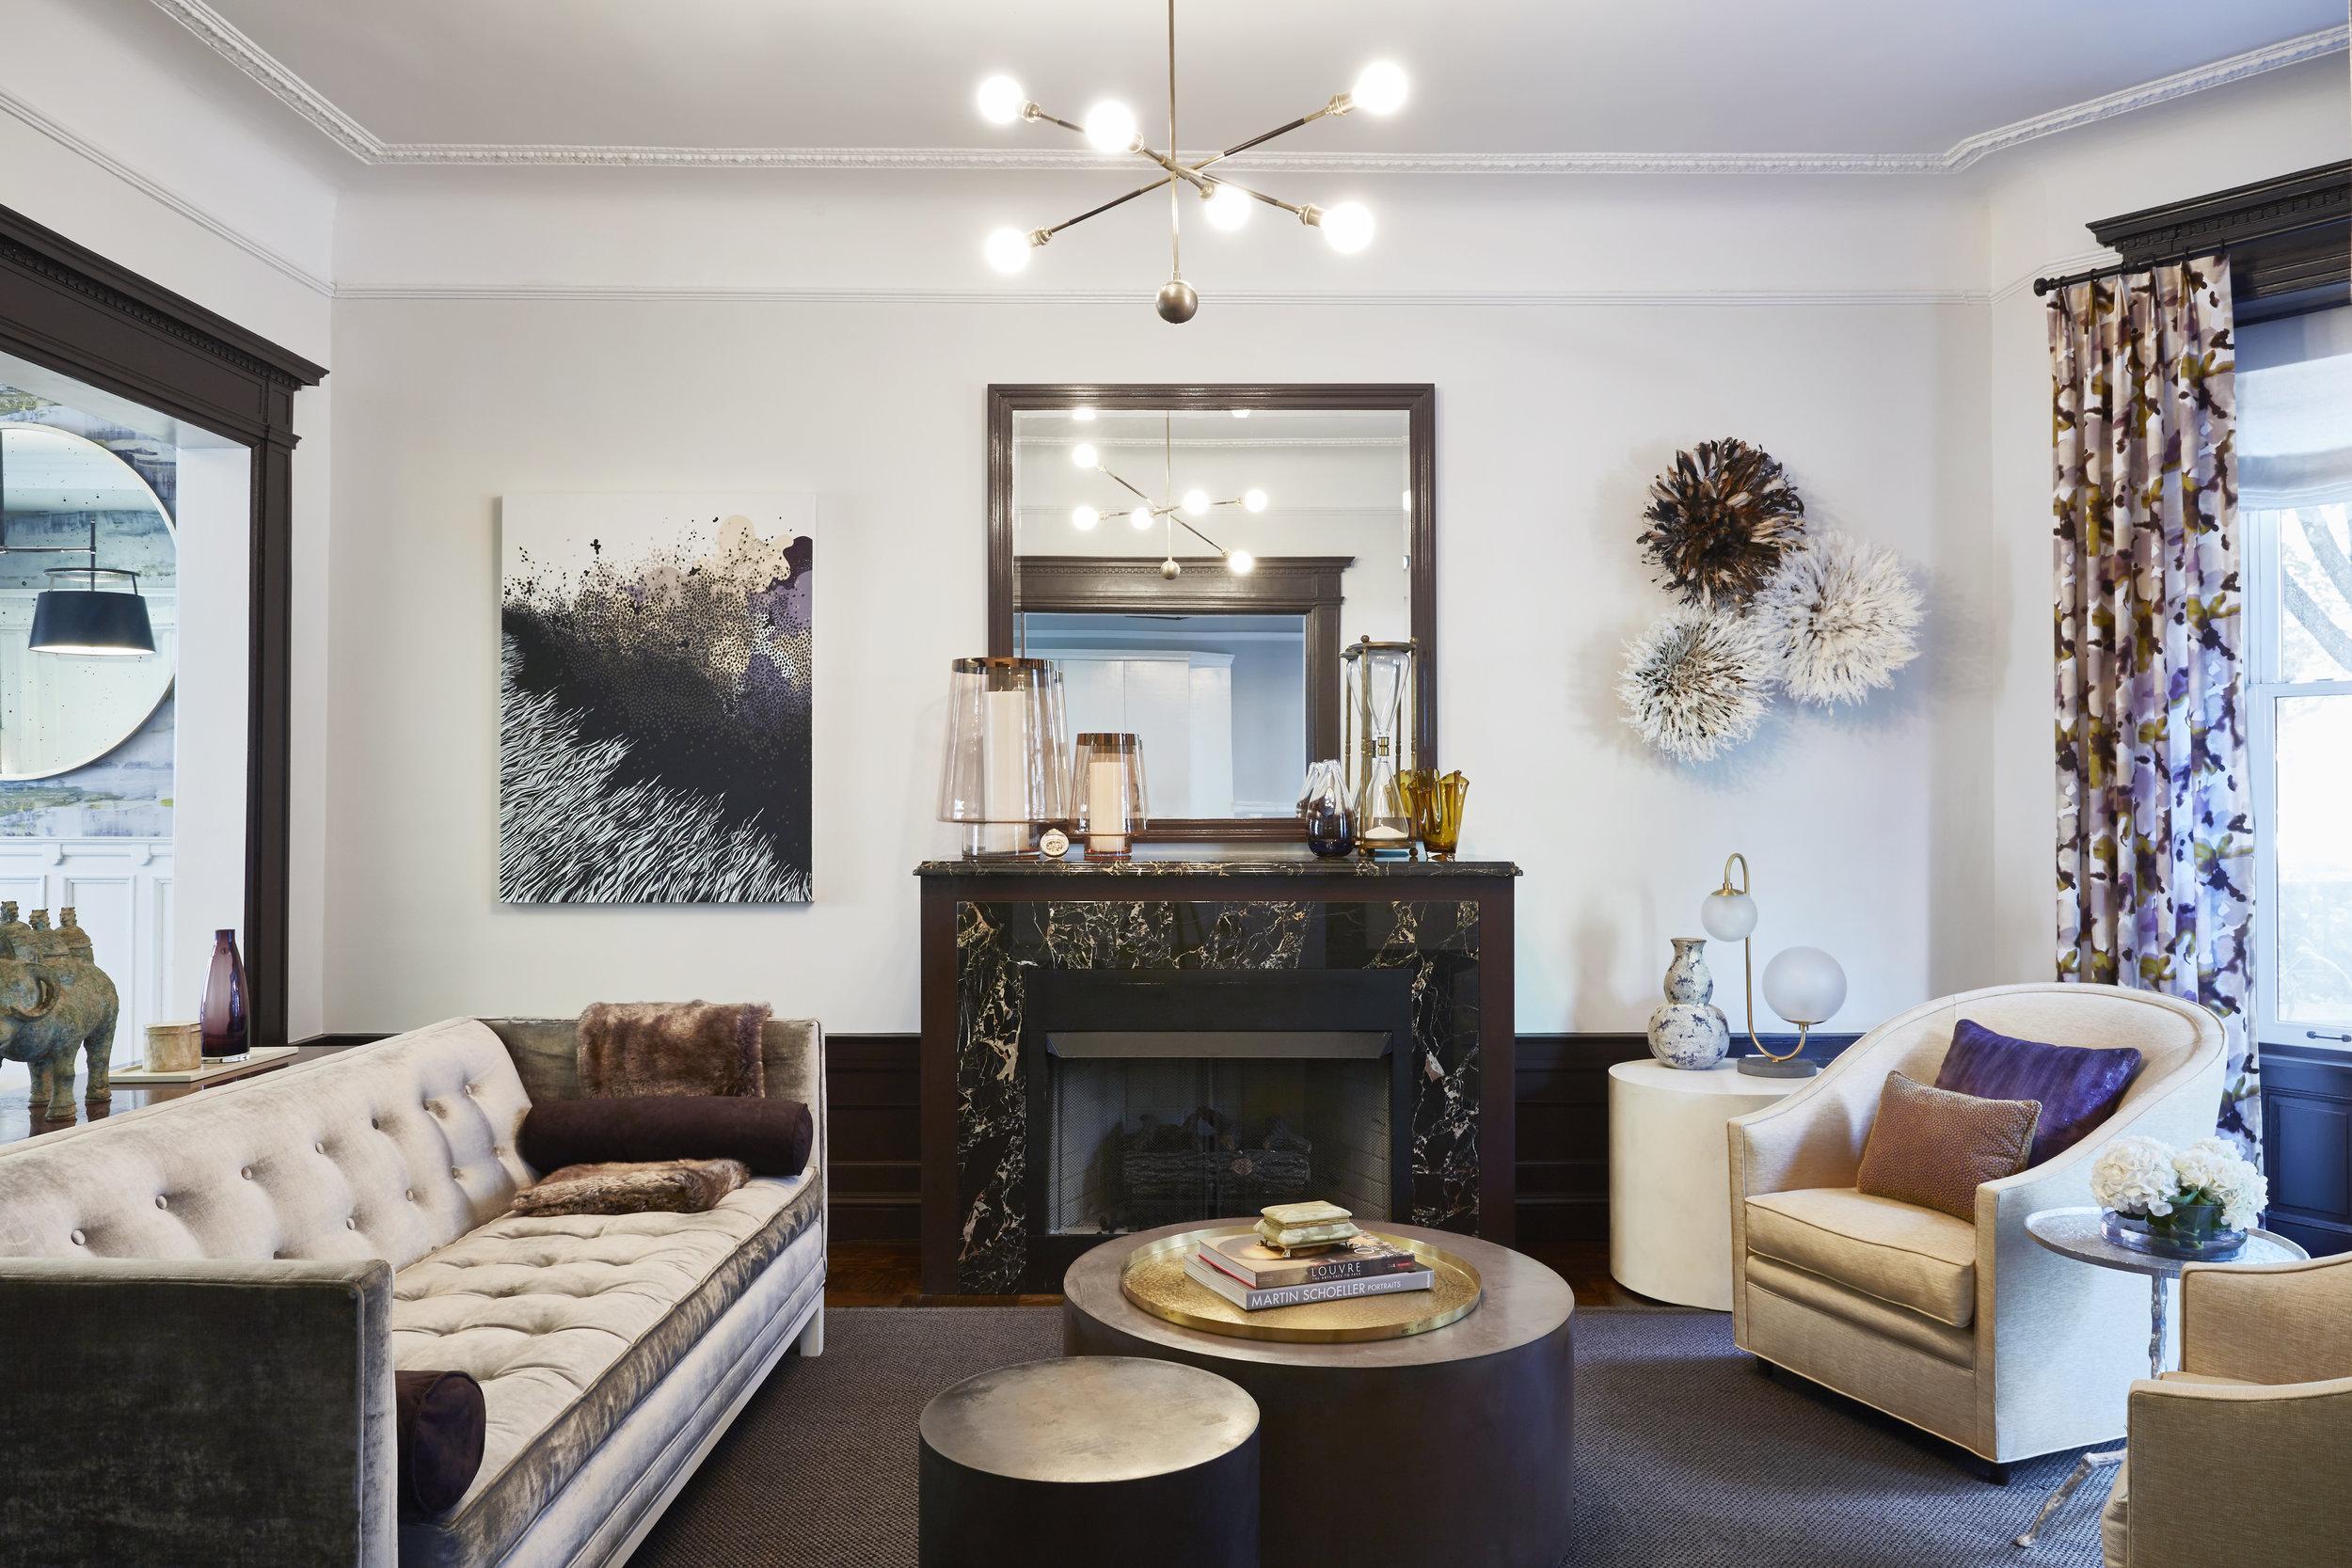 Elegant-Living-Room-Wall-Art-Fireplace-Chandelier.jpg